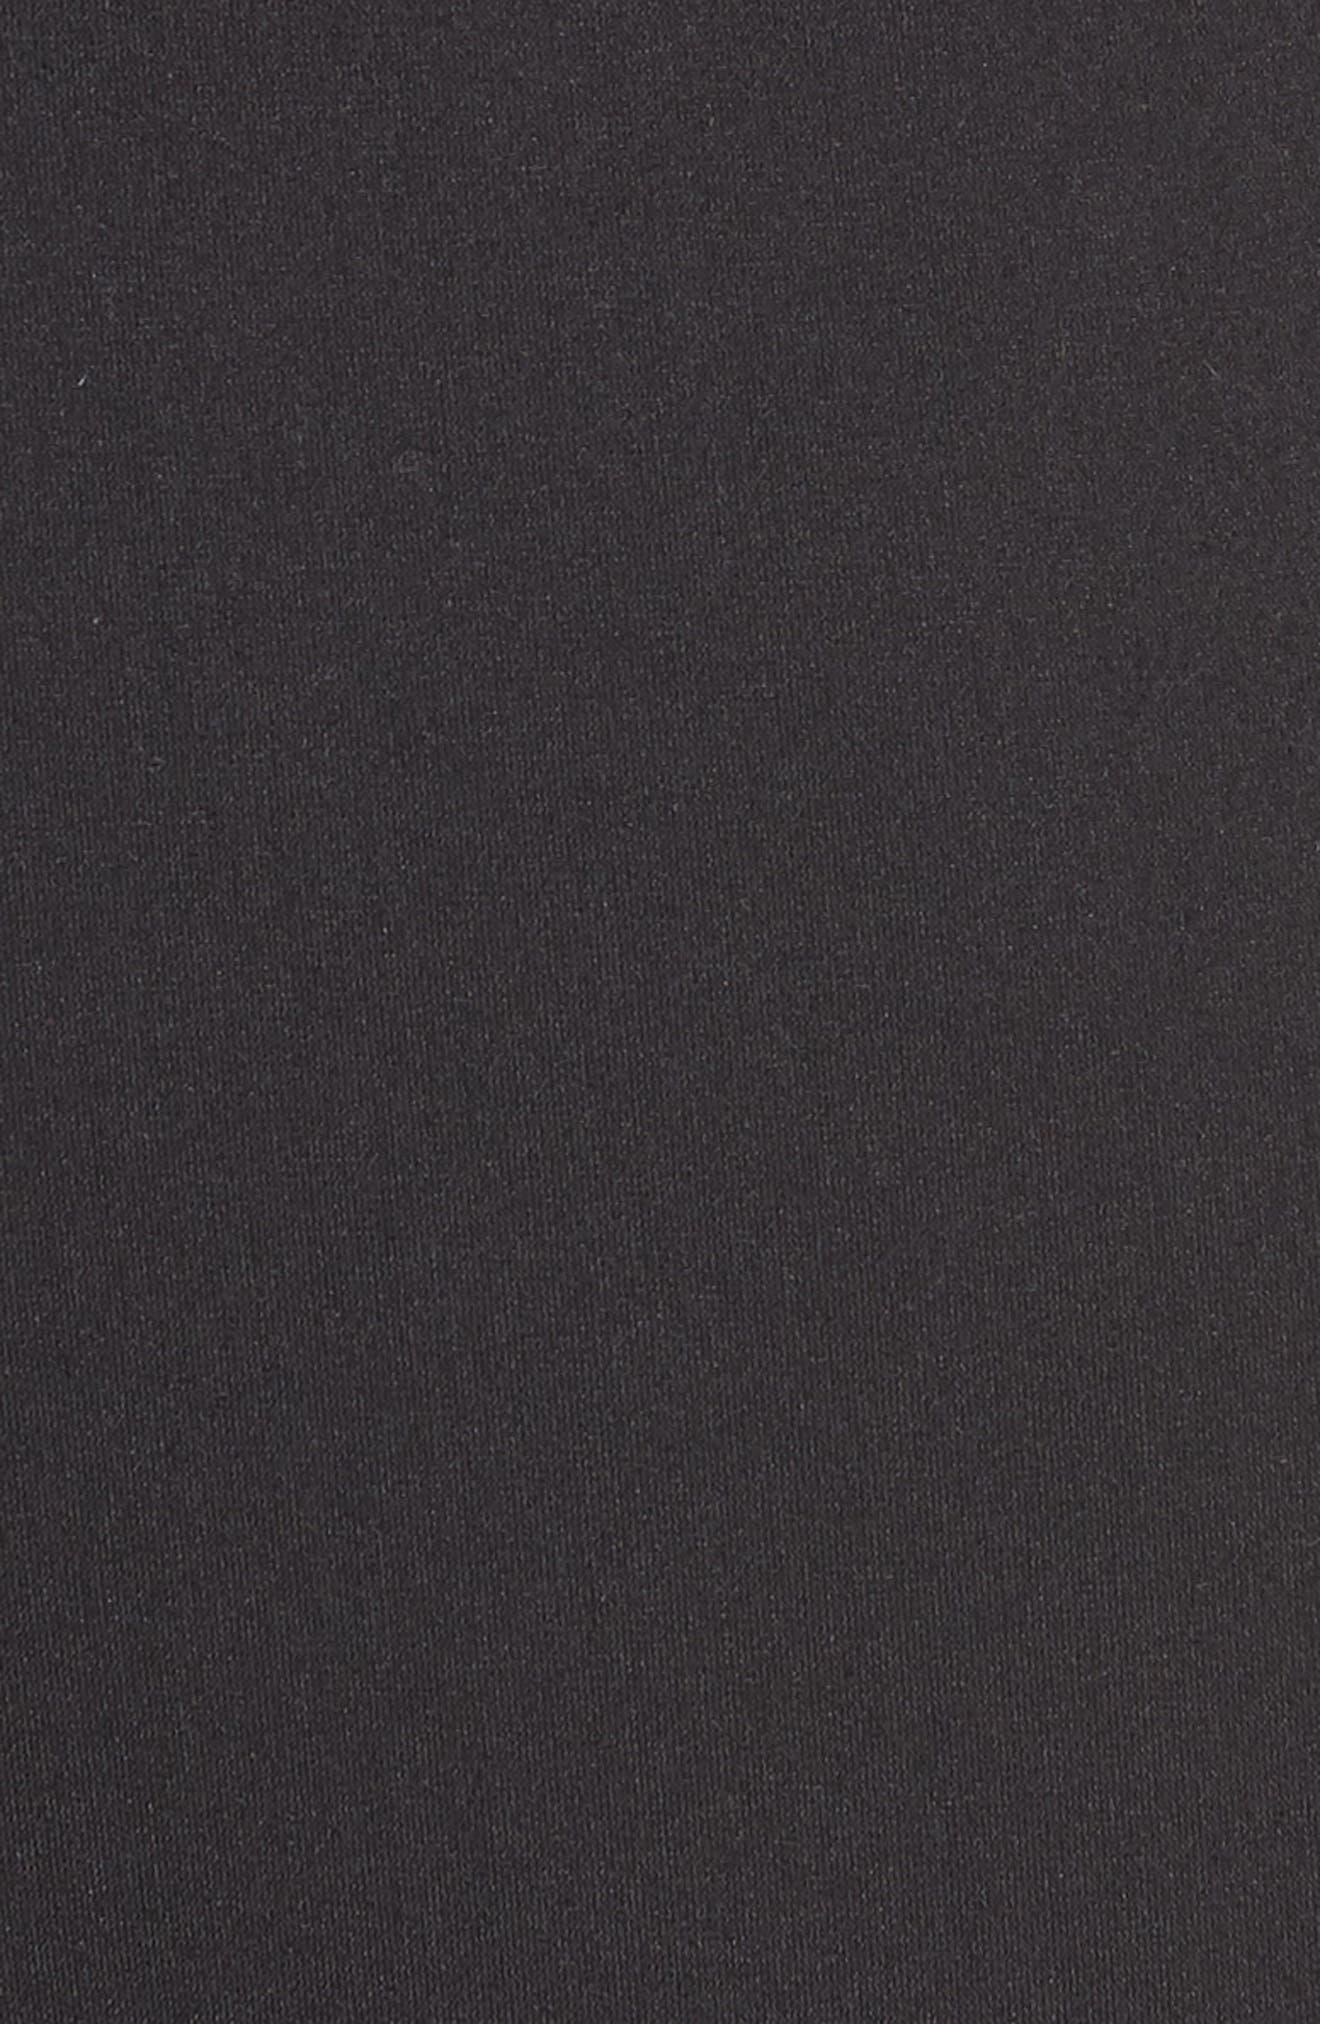 Ultimate Transitional Regular Fit Shorts,                             Alternate thumbnail 5, color,                             Black